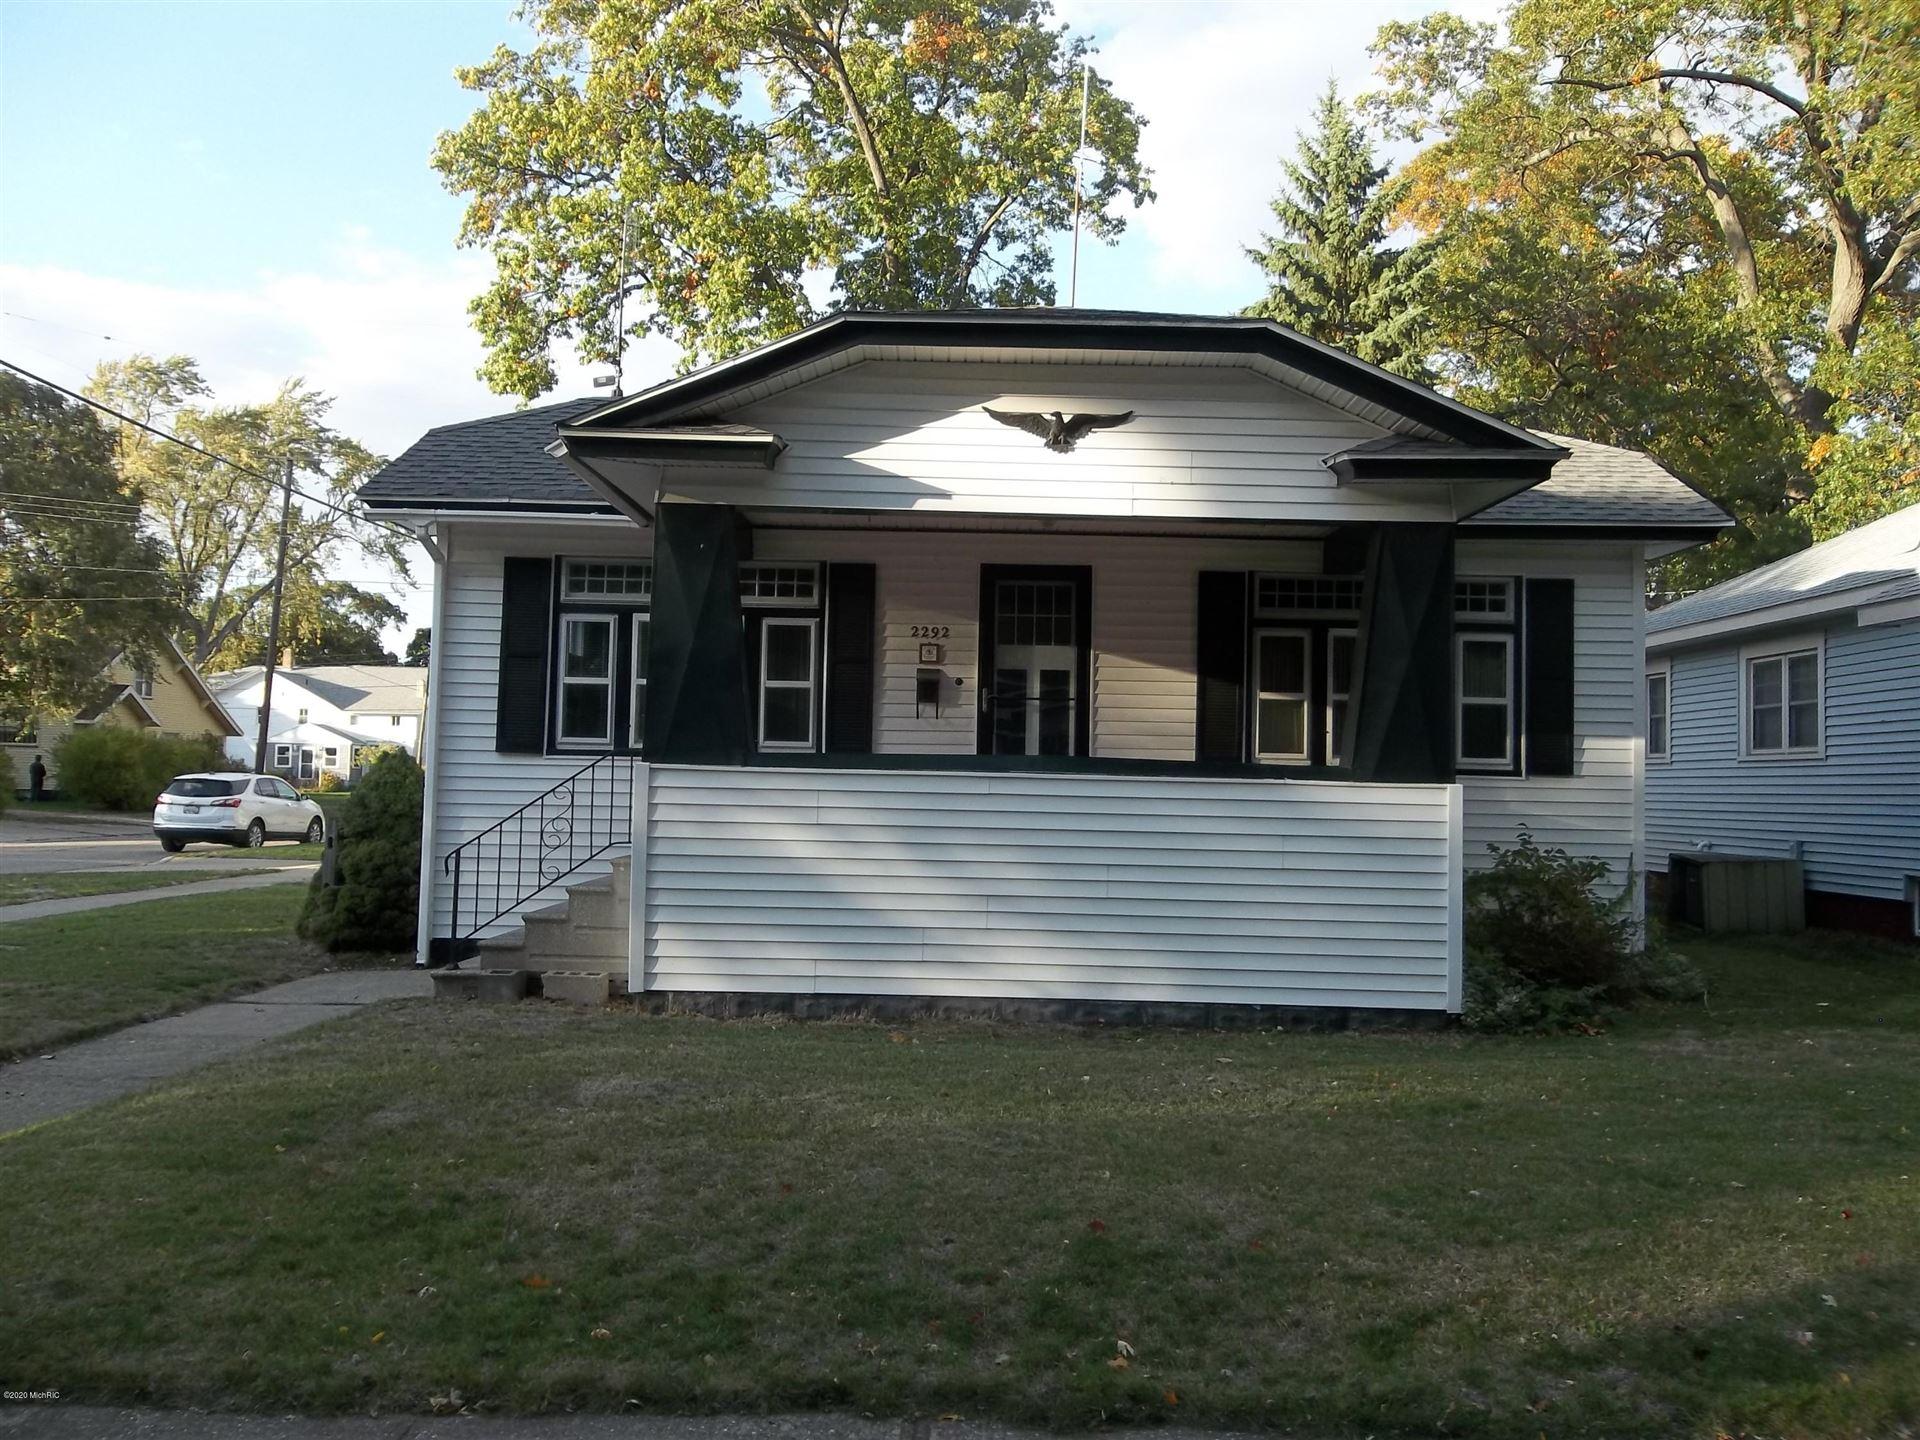 2292 Miner Avenue, Muskegon, MI 49441 - MLS#: 20043317